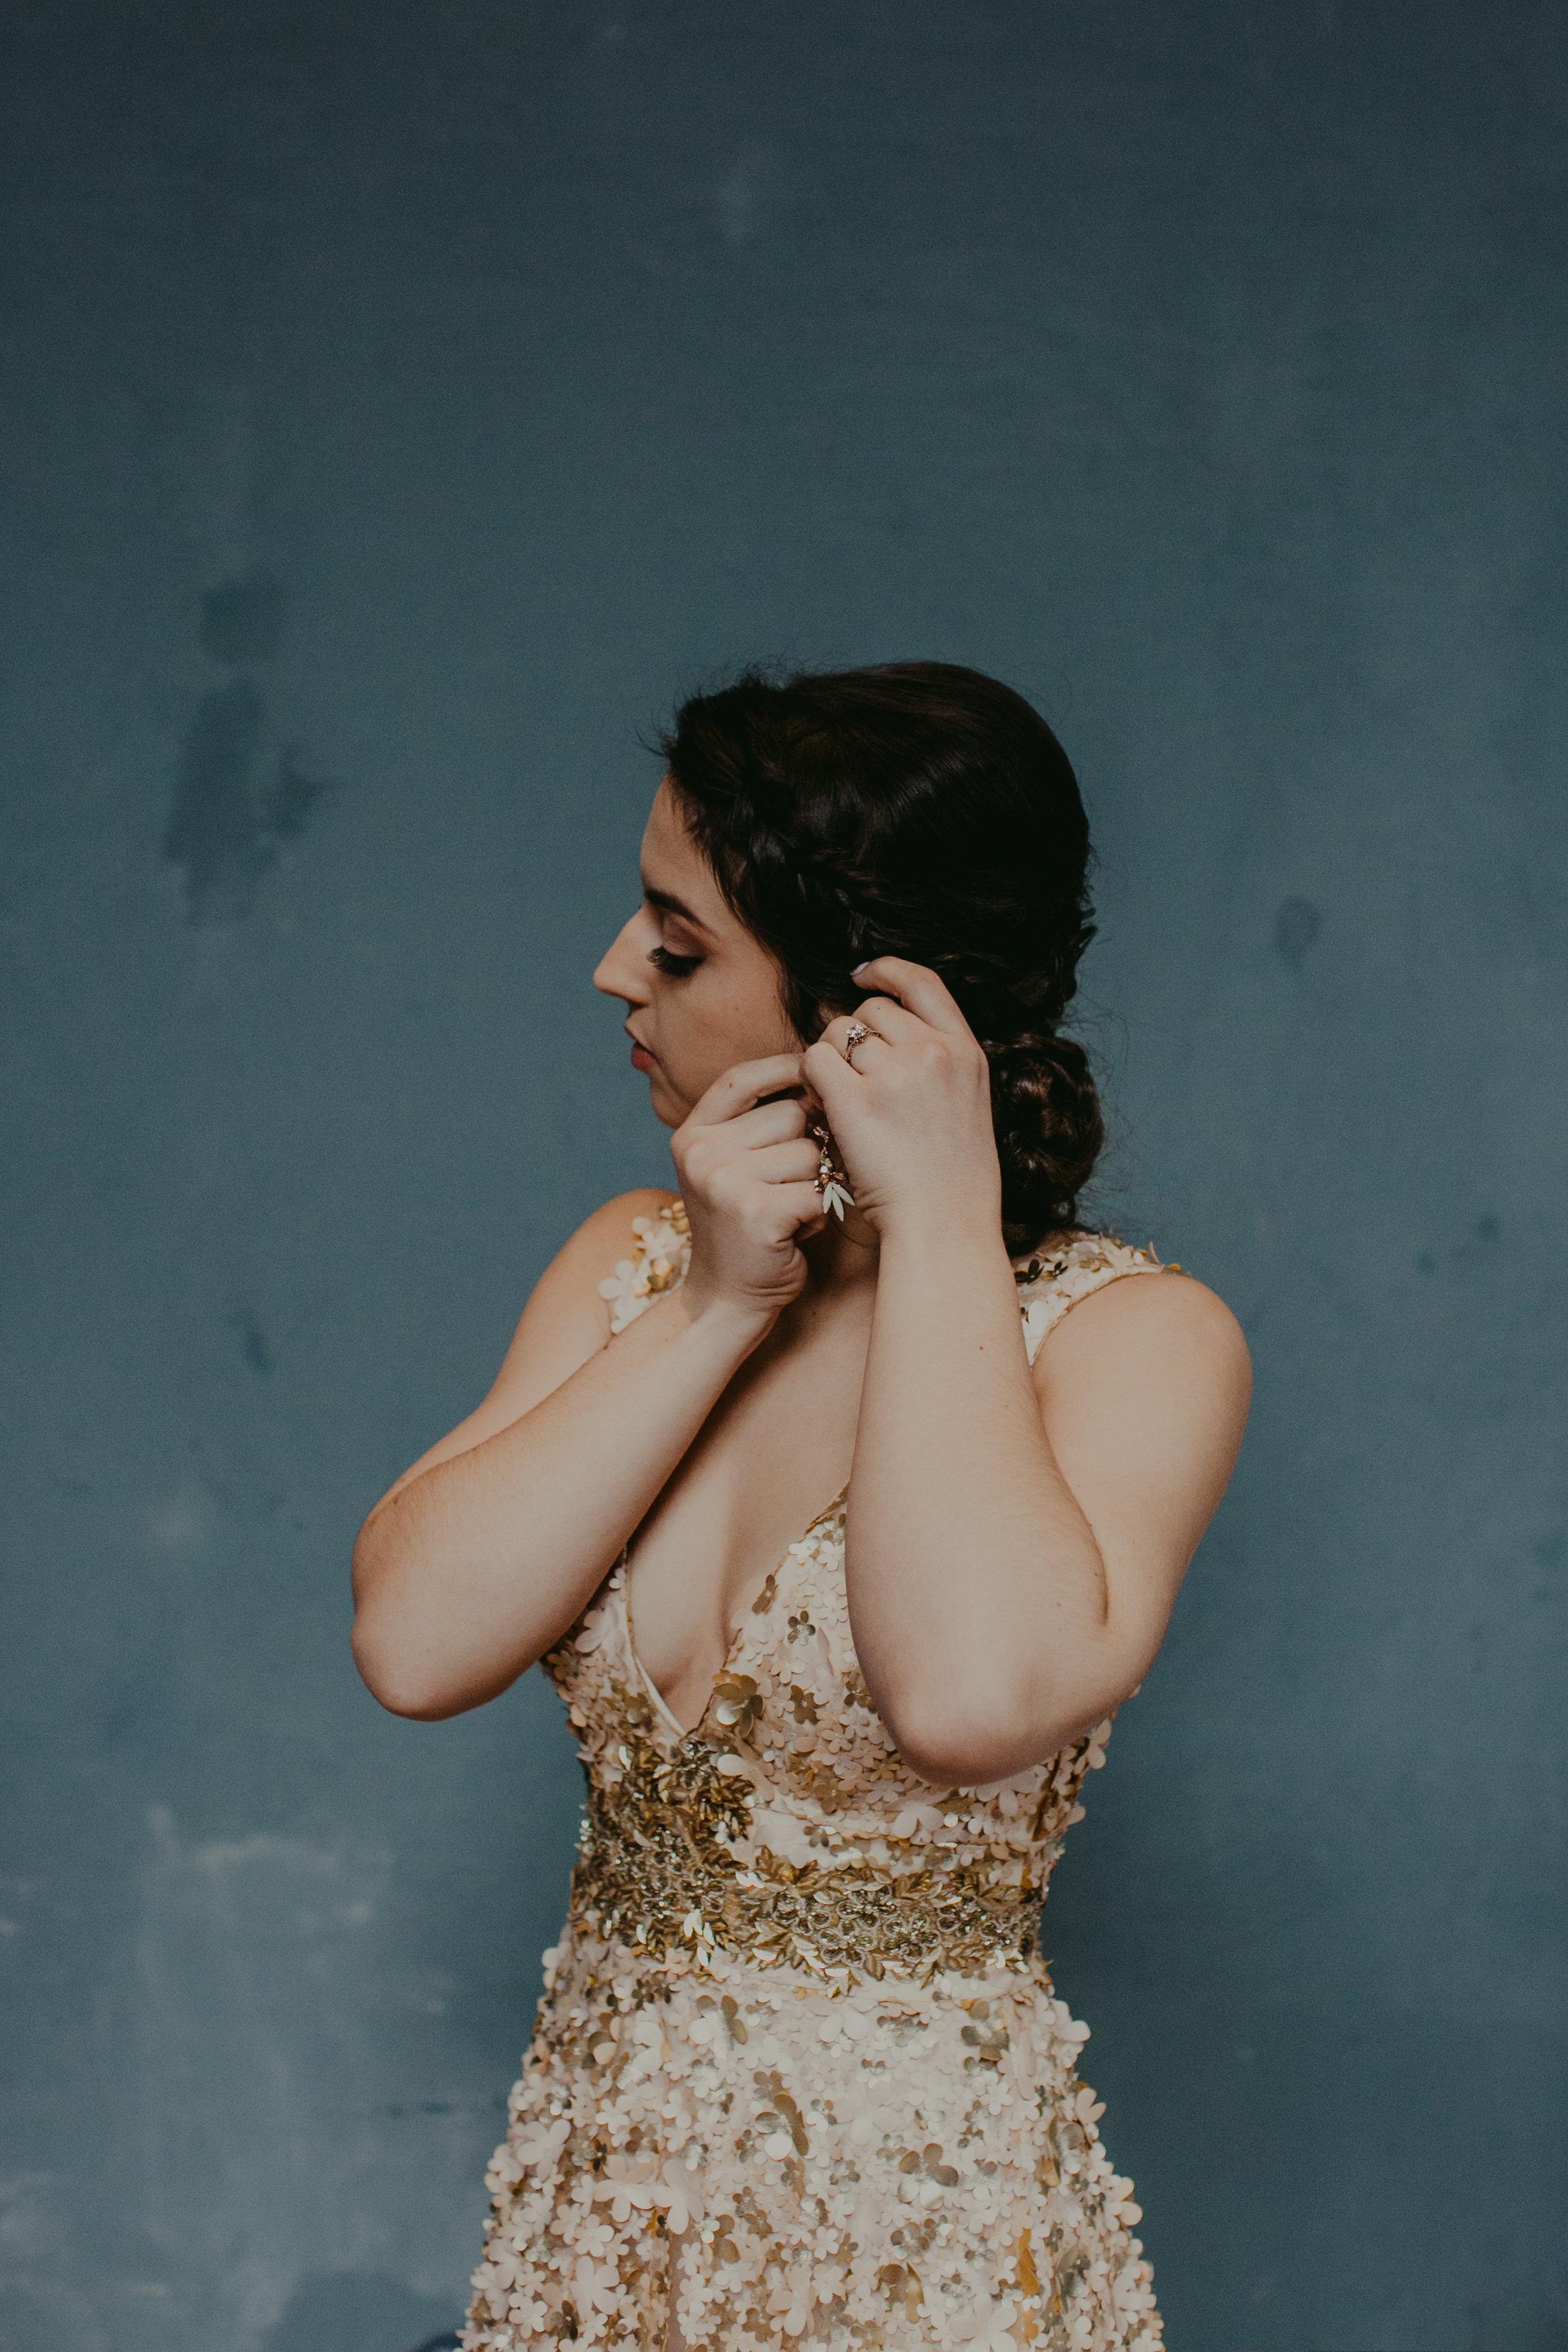 Williamsburg_Hotel_Wedding_Photographer_Chellise_Michael_Photography-120.jpg